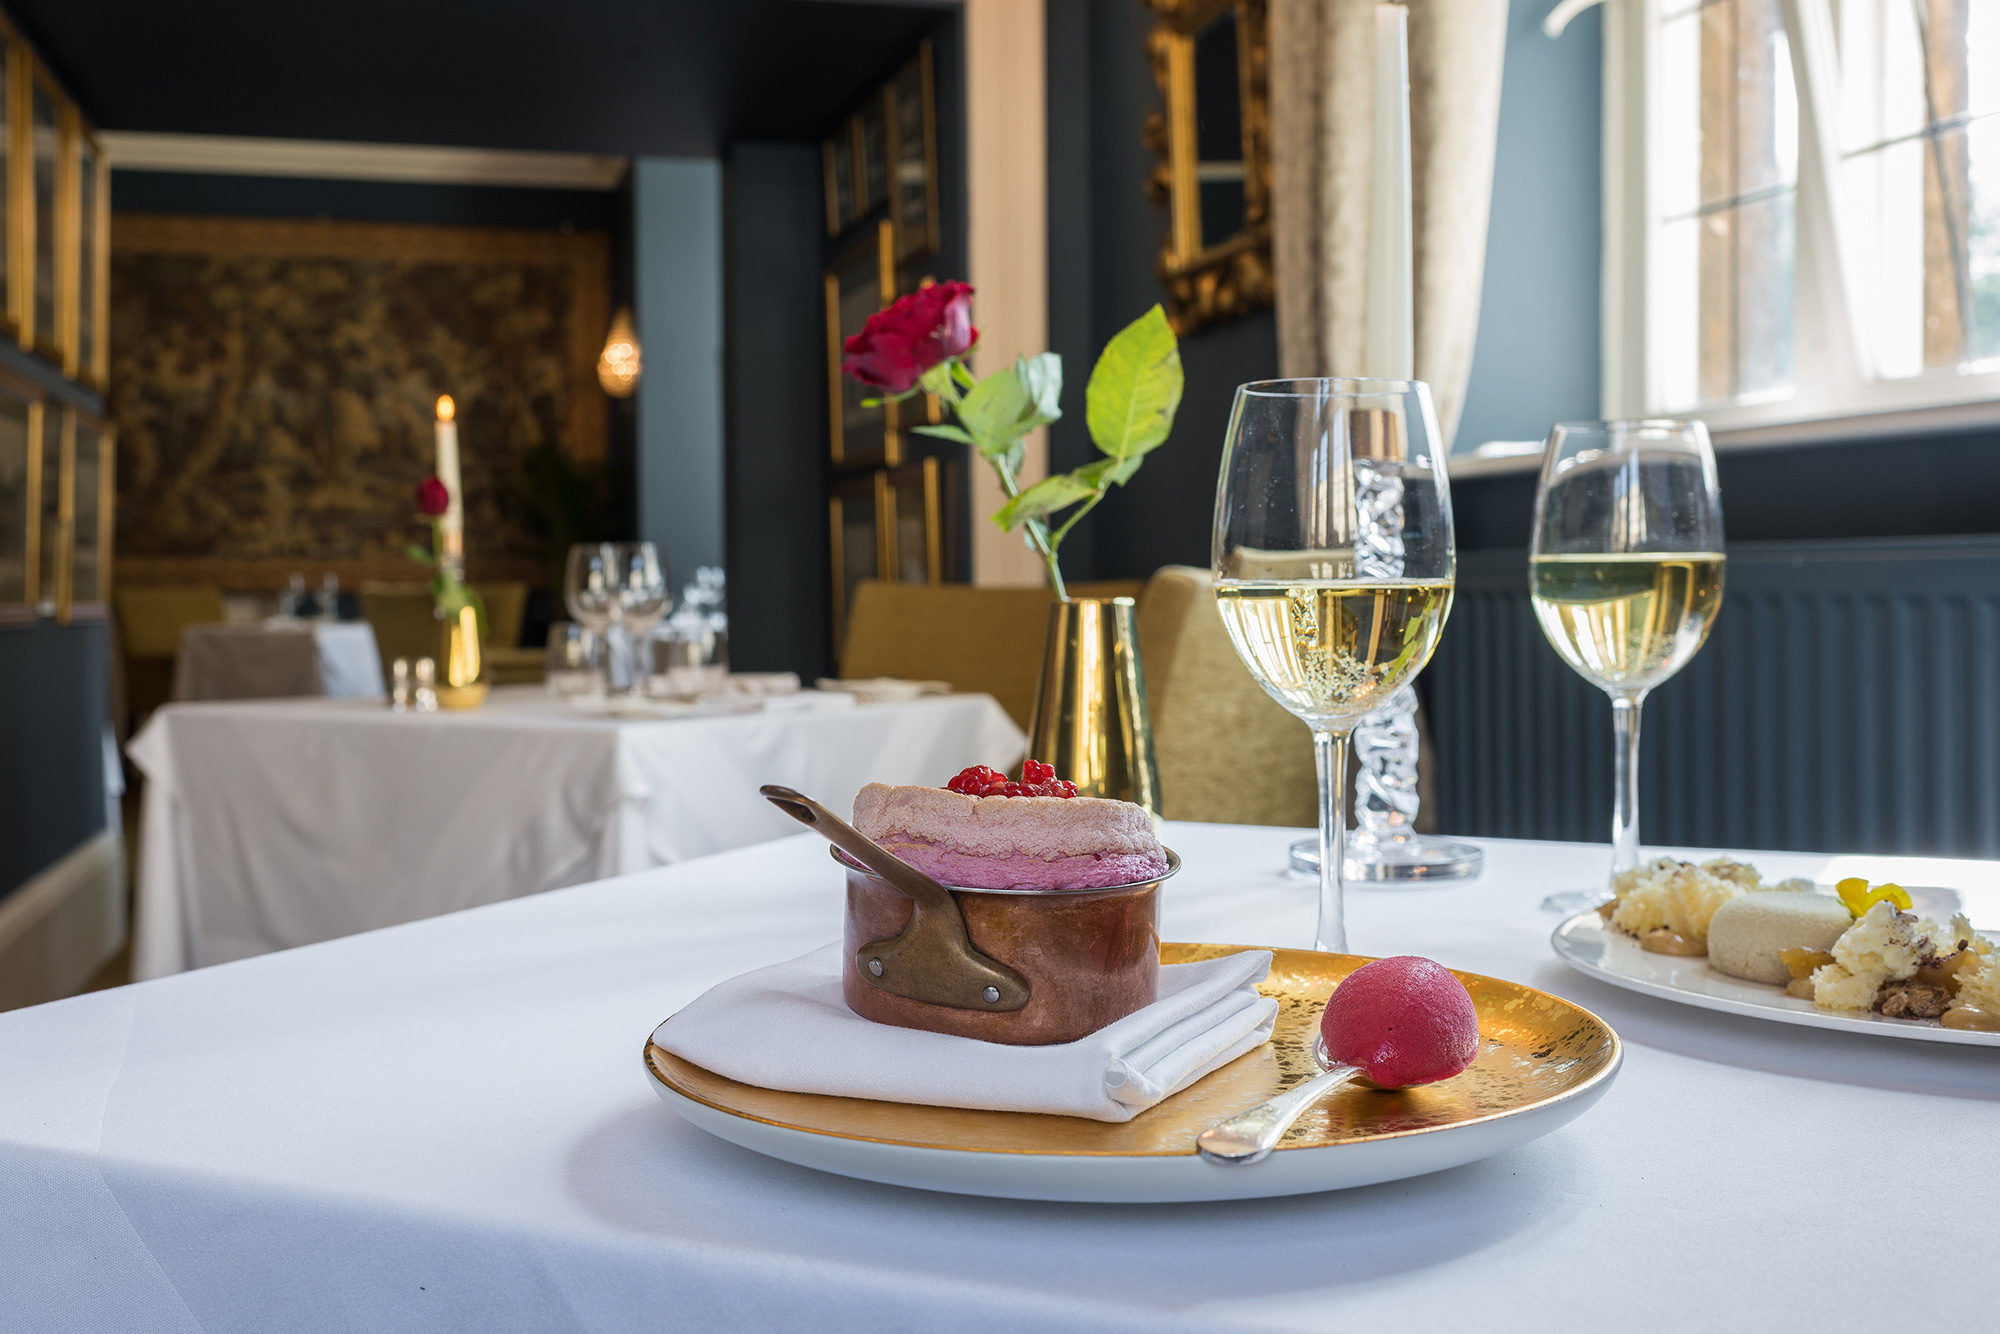 hotel-restaurant-dessert-food-photography.jpg